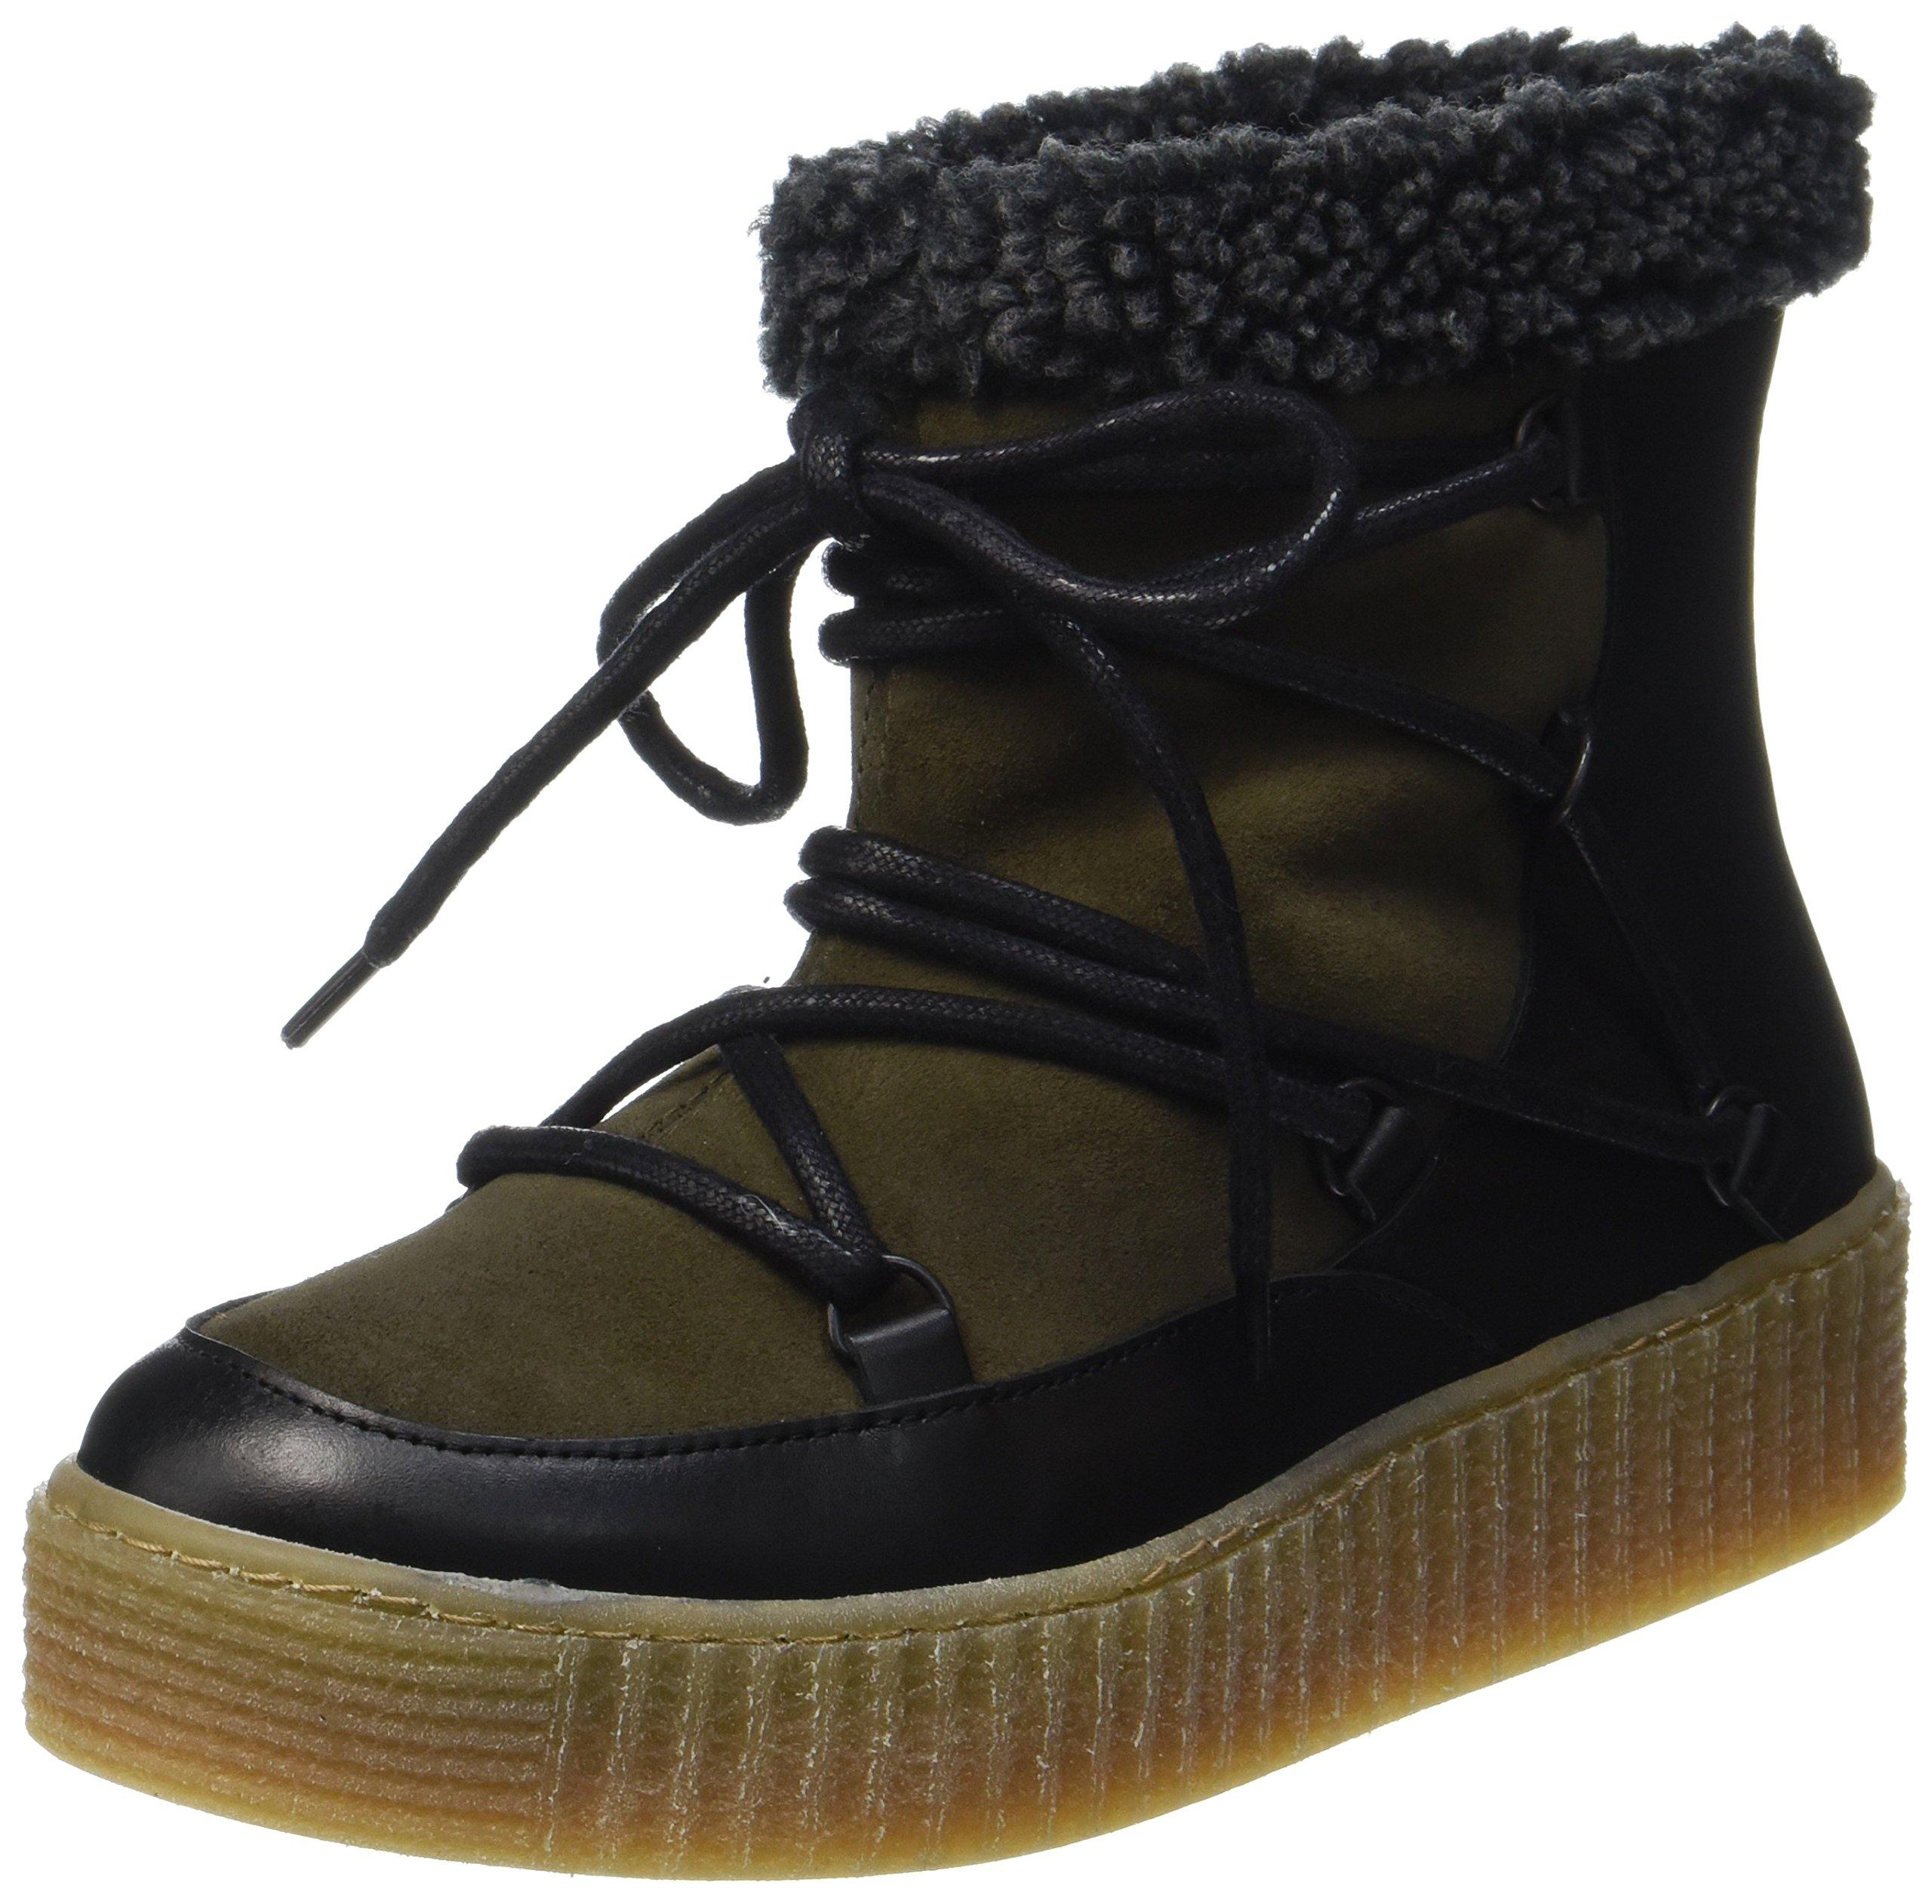 Pspaccia Neige Eu Boot OliveBottes Leather Dark FemmesVert38 Pieces De 8wPX0nOk